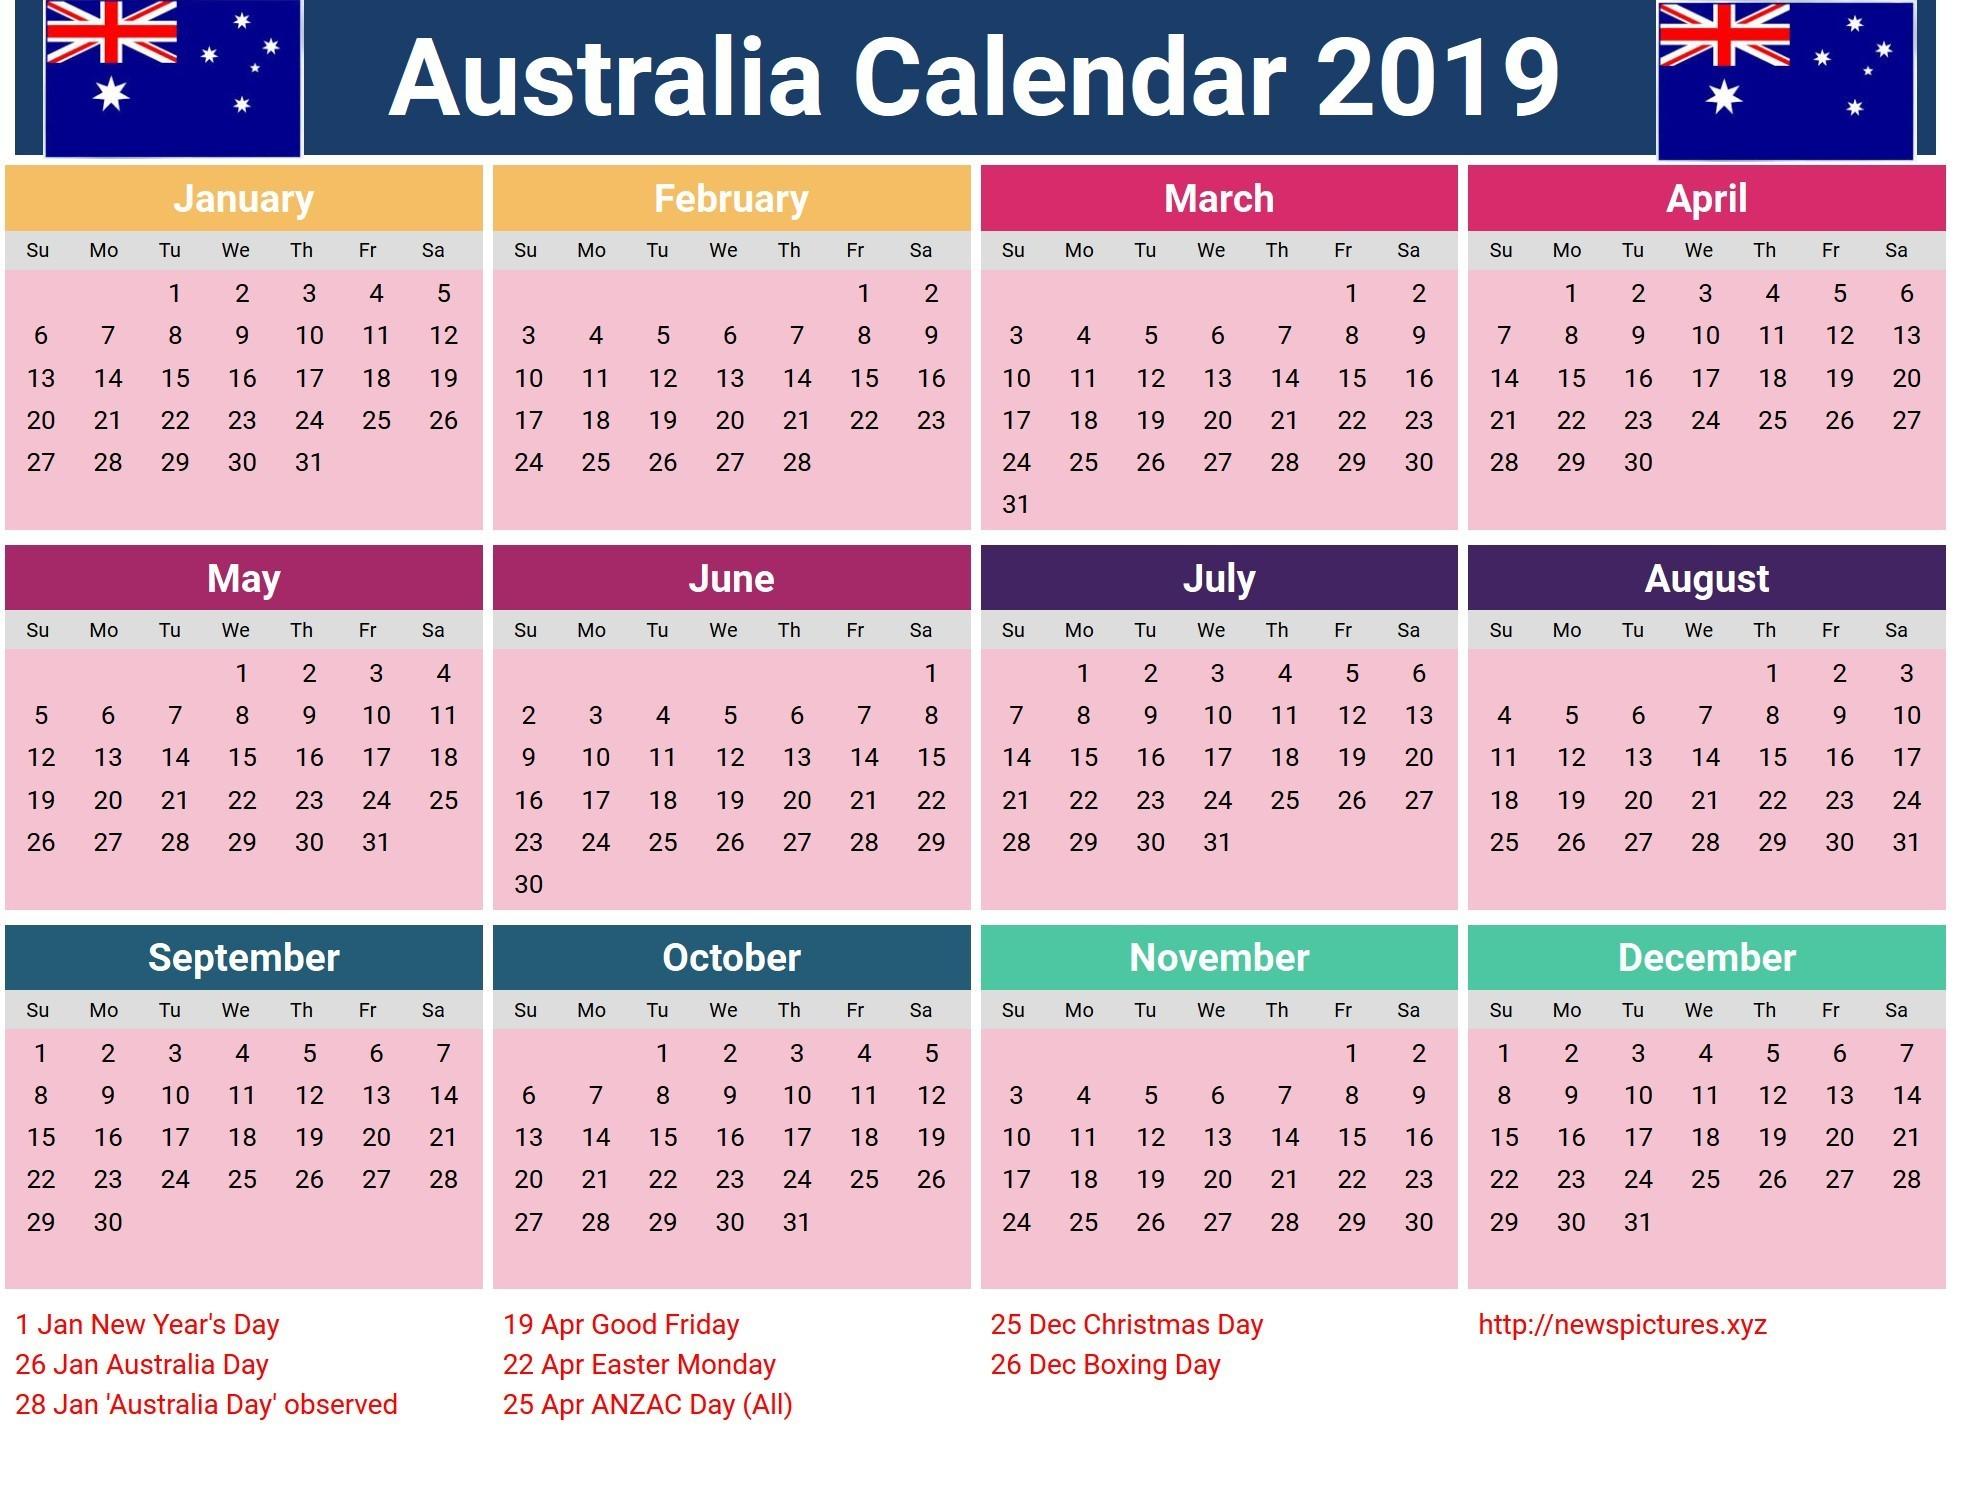 2019 Calendar Template Australia United Kingdom 2019 Holidays Calendar 2019 Calendar Template Australia 89 Free